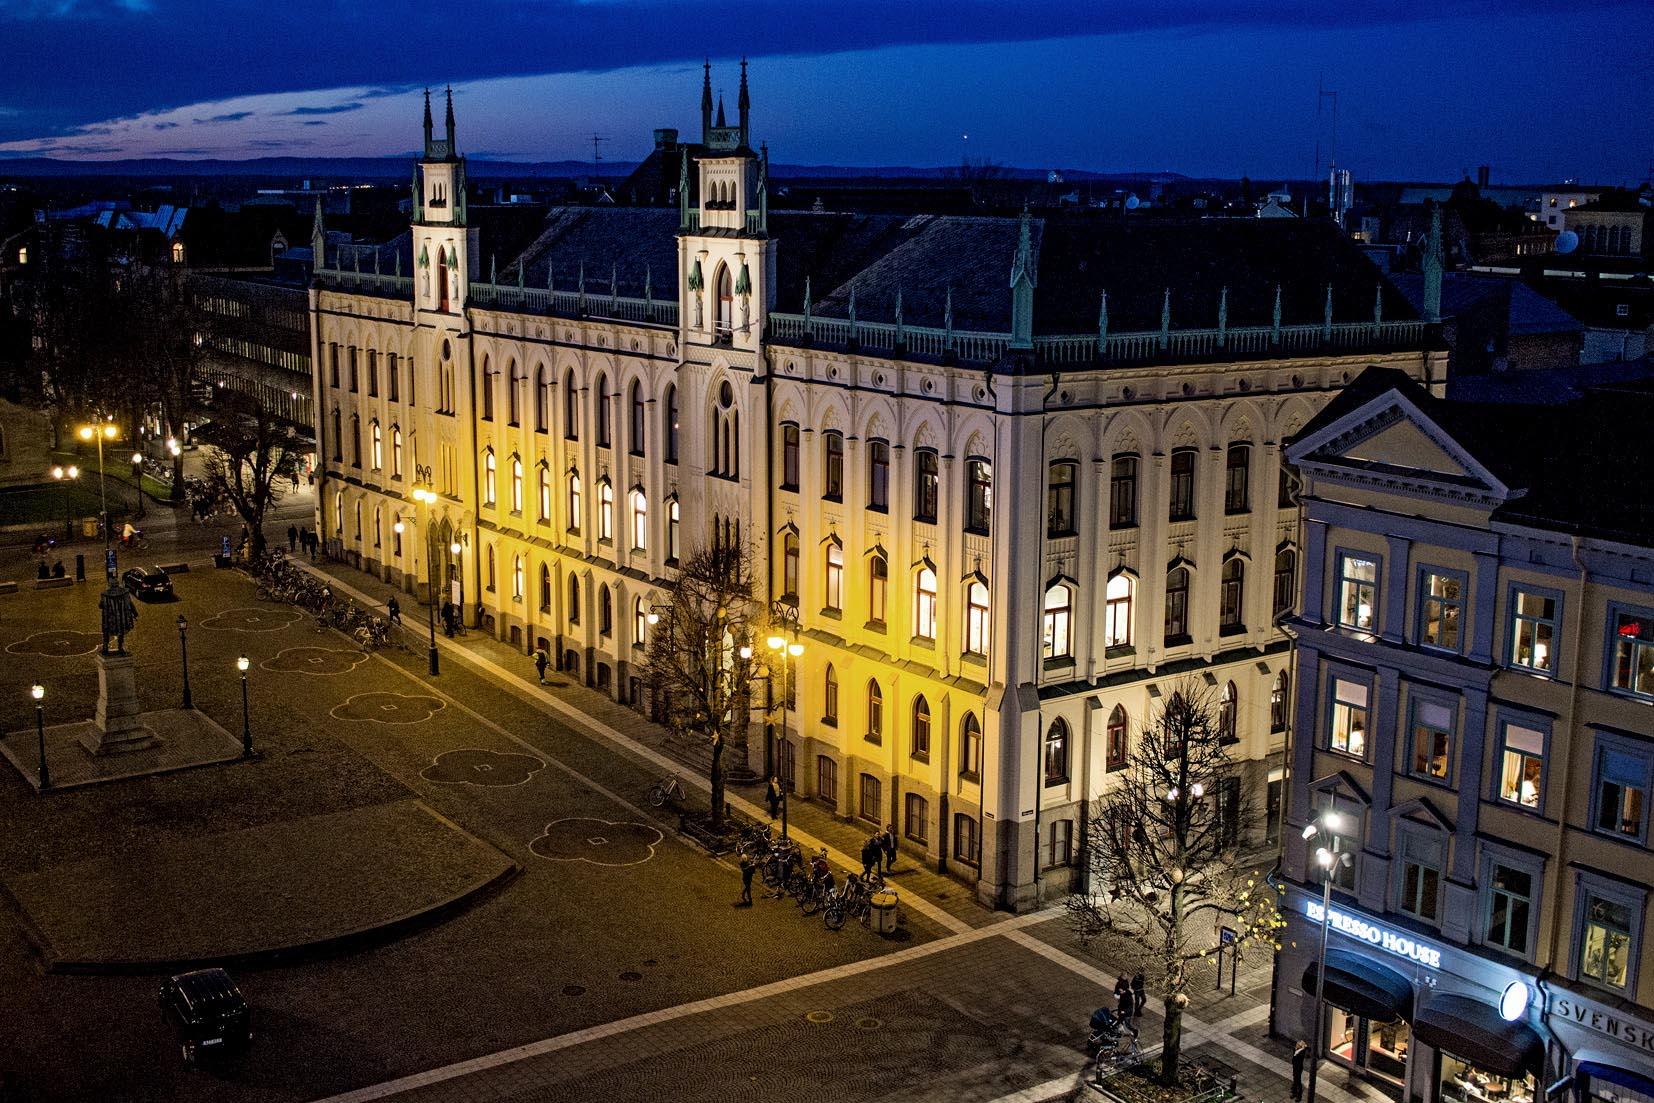 Örebroporten - Rådhuset